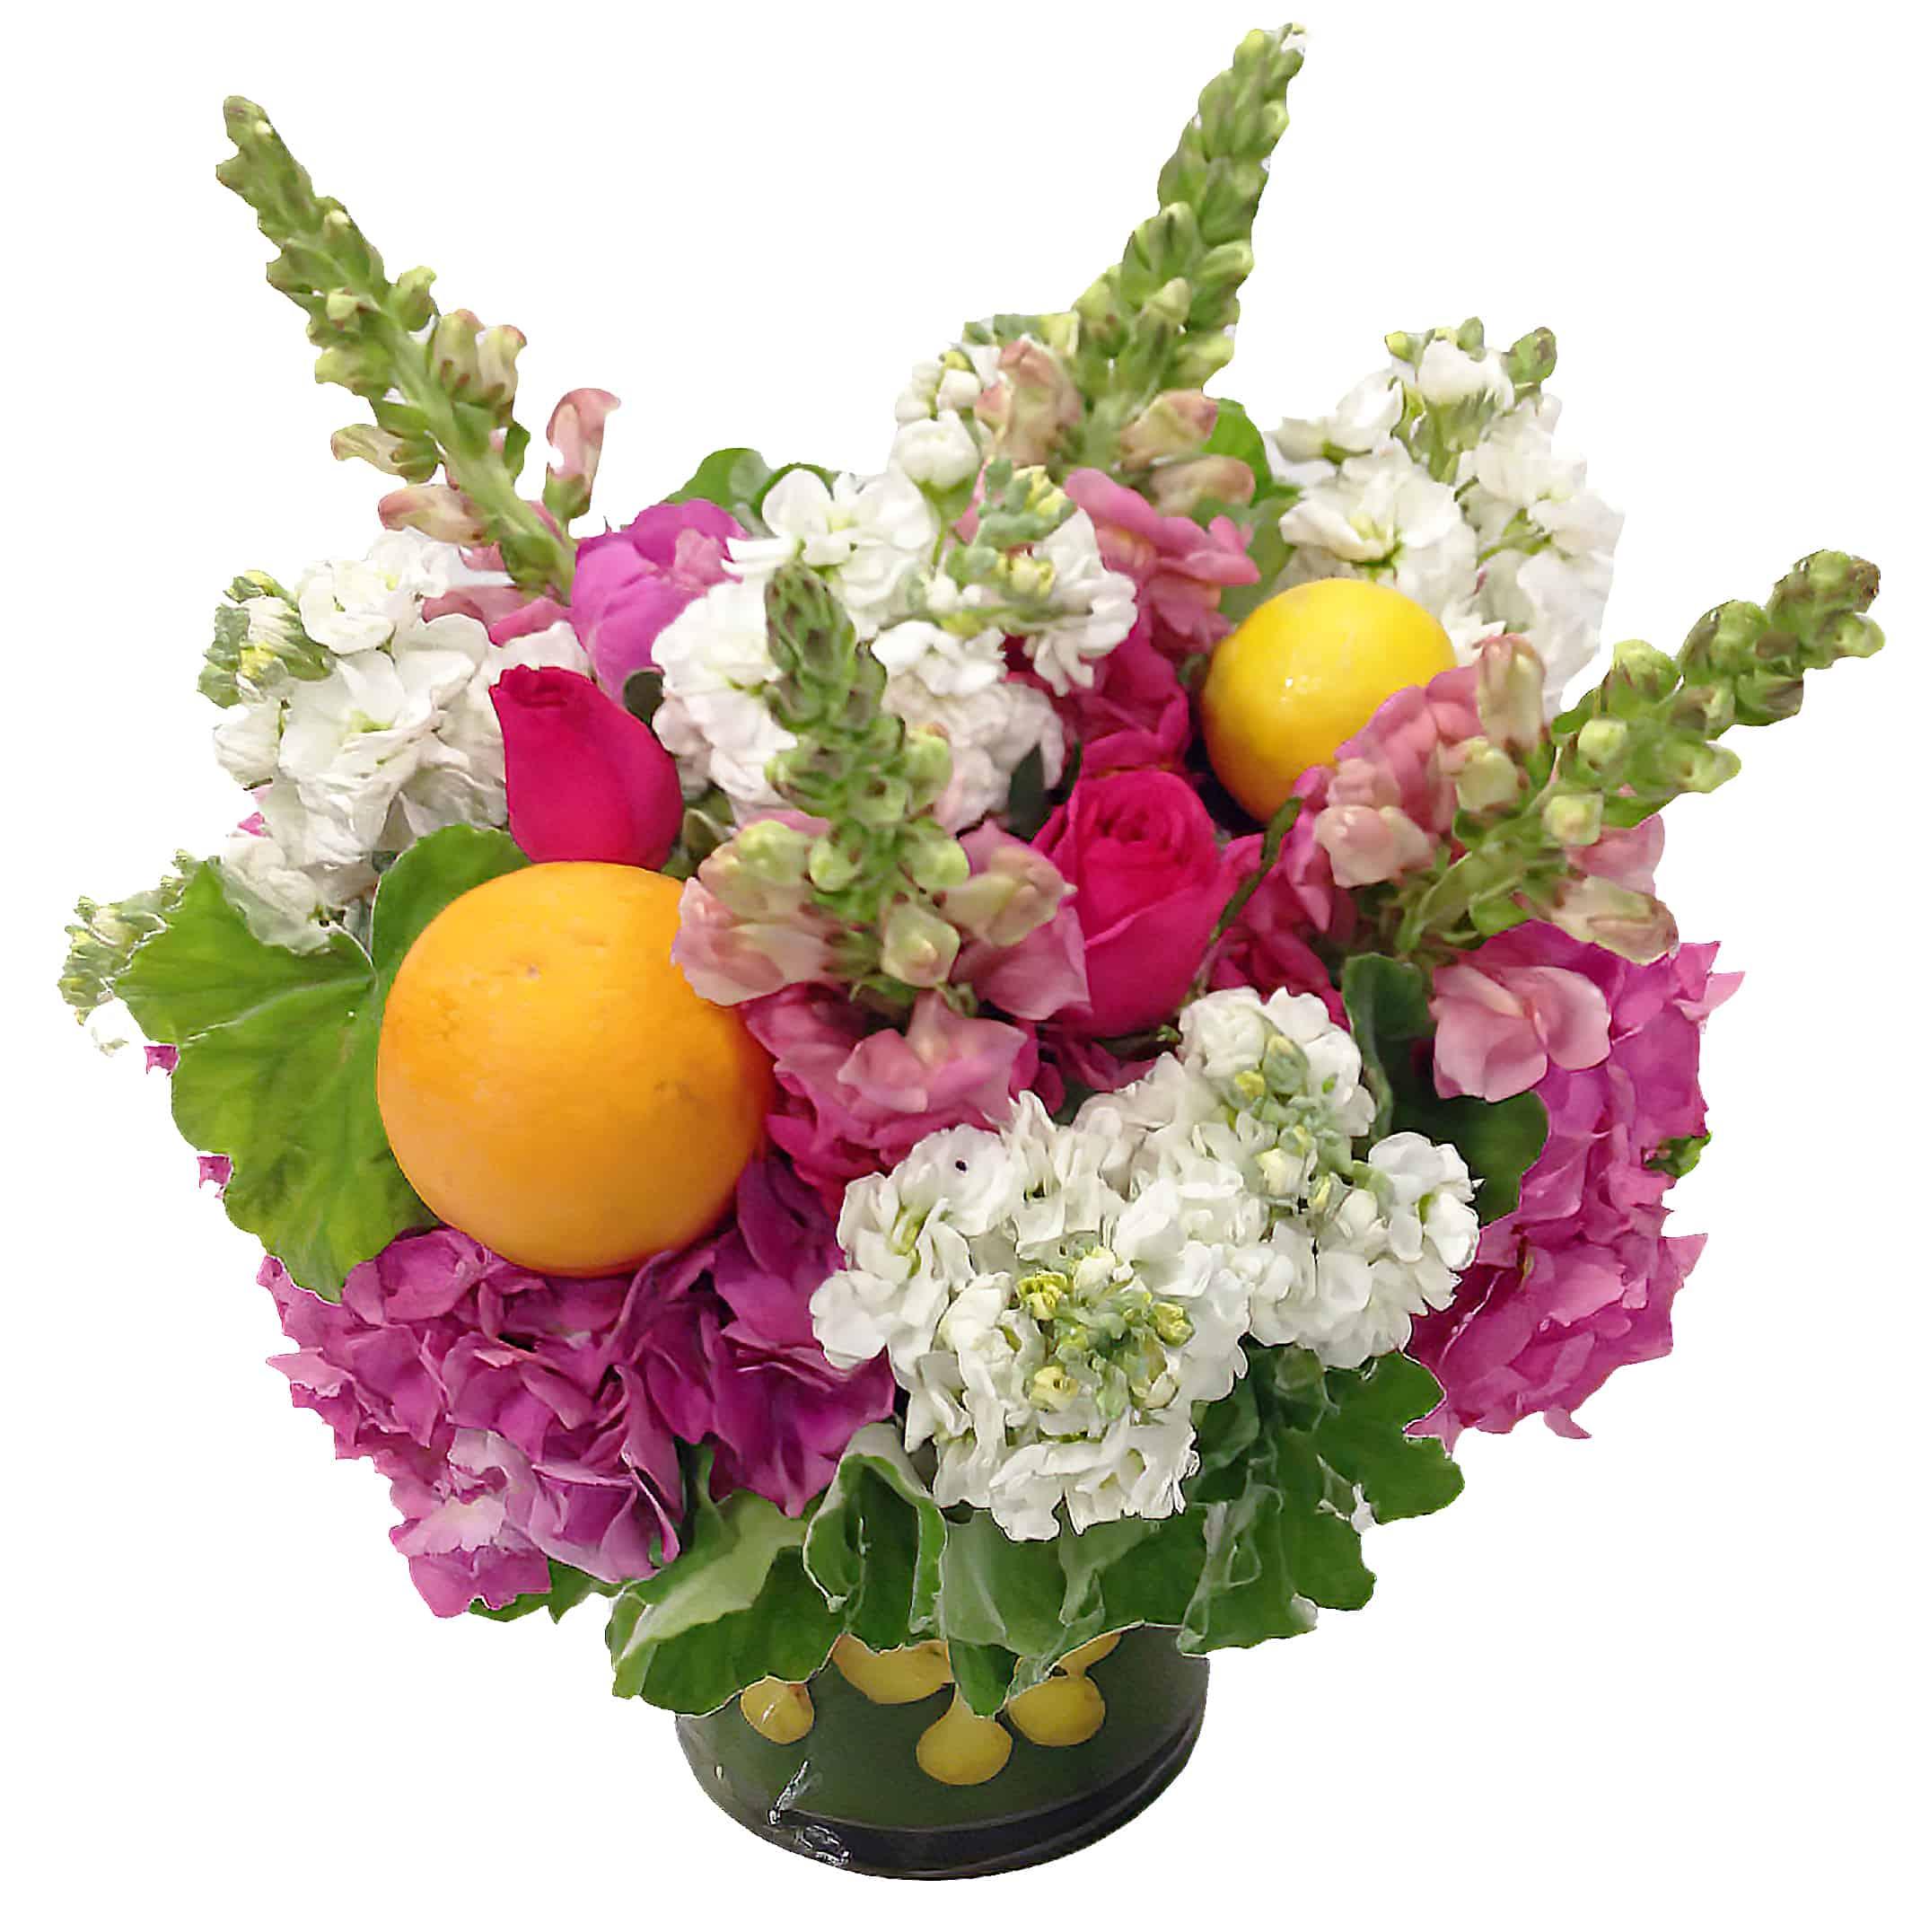 Convivial One Flower arrangement